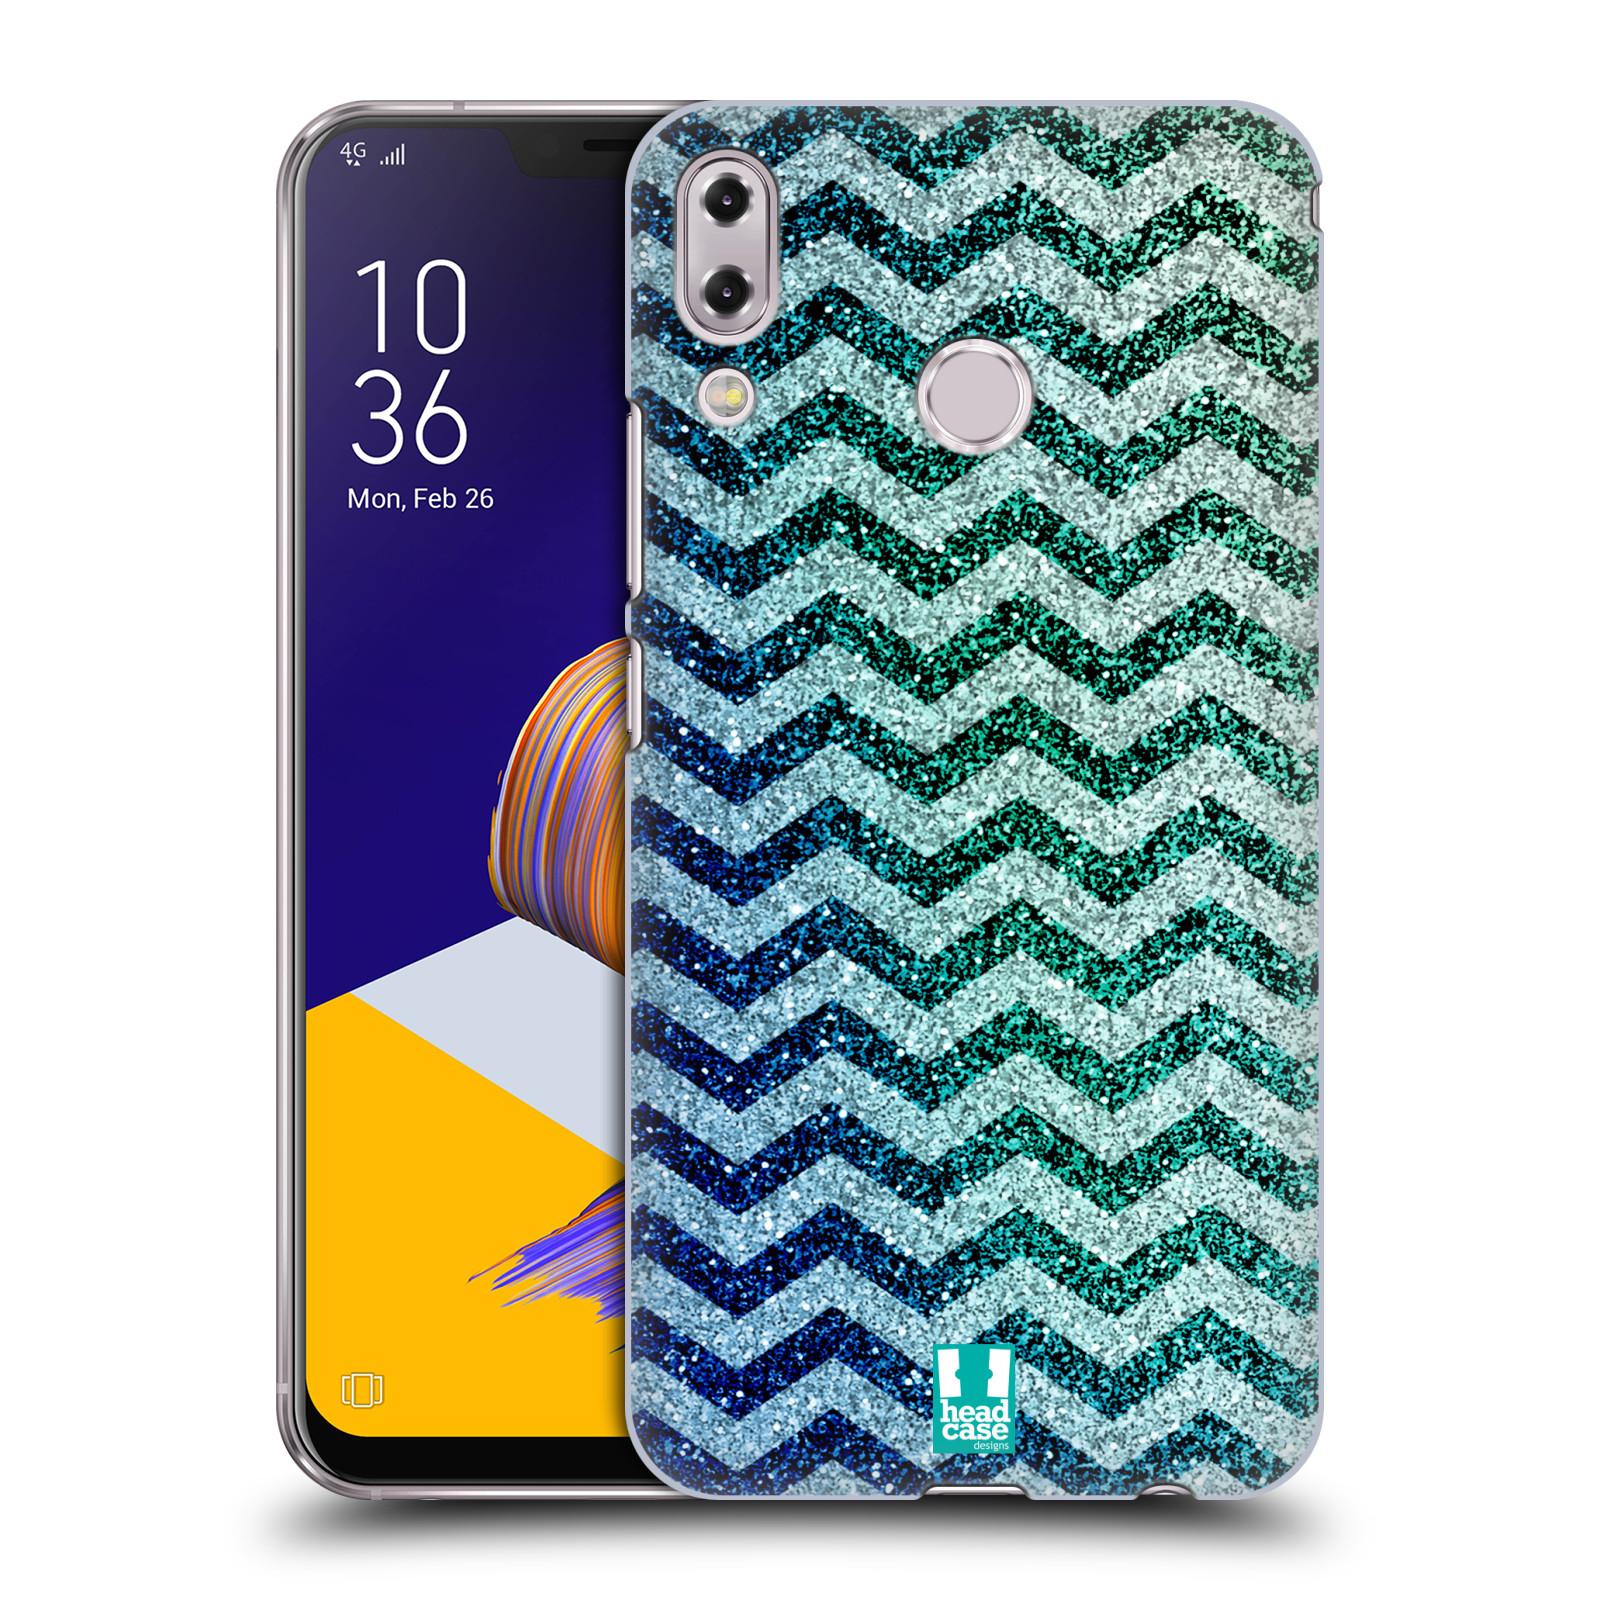 Plastové pouzdro na mobil Asus Zenfone 5z ZS620KL - Head Case - MIX CHEVRON (Plastový kryt či obal na mobilní telefon Asus Zenfone 5z (ZS620KL) s motivem MIX CHEVRON)